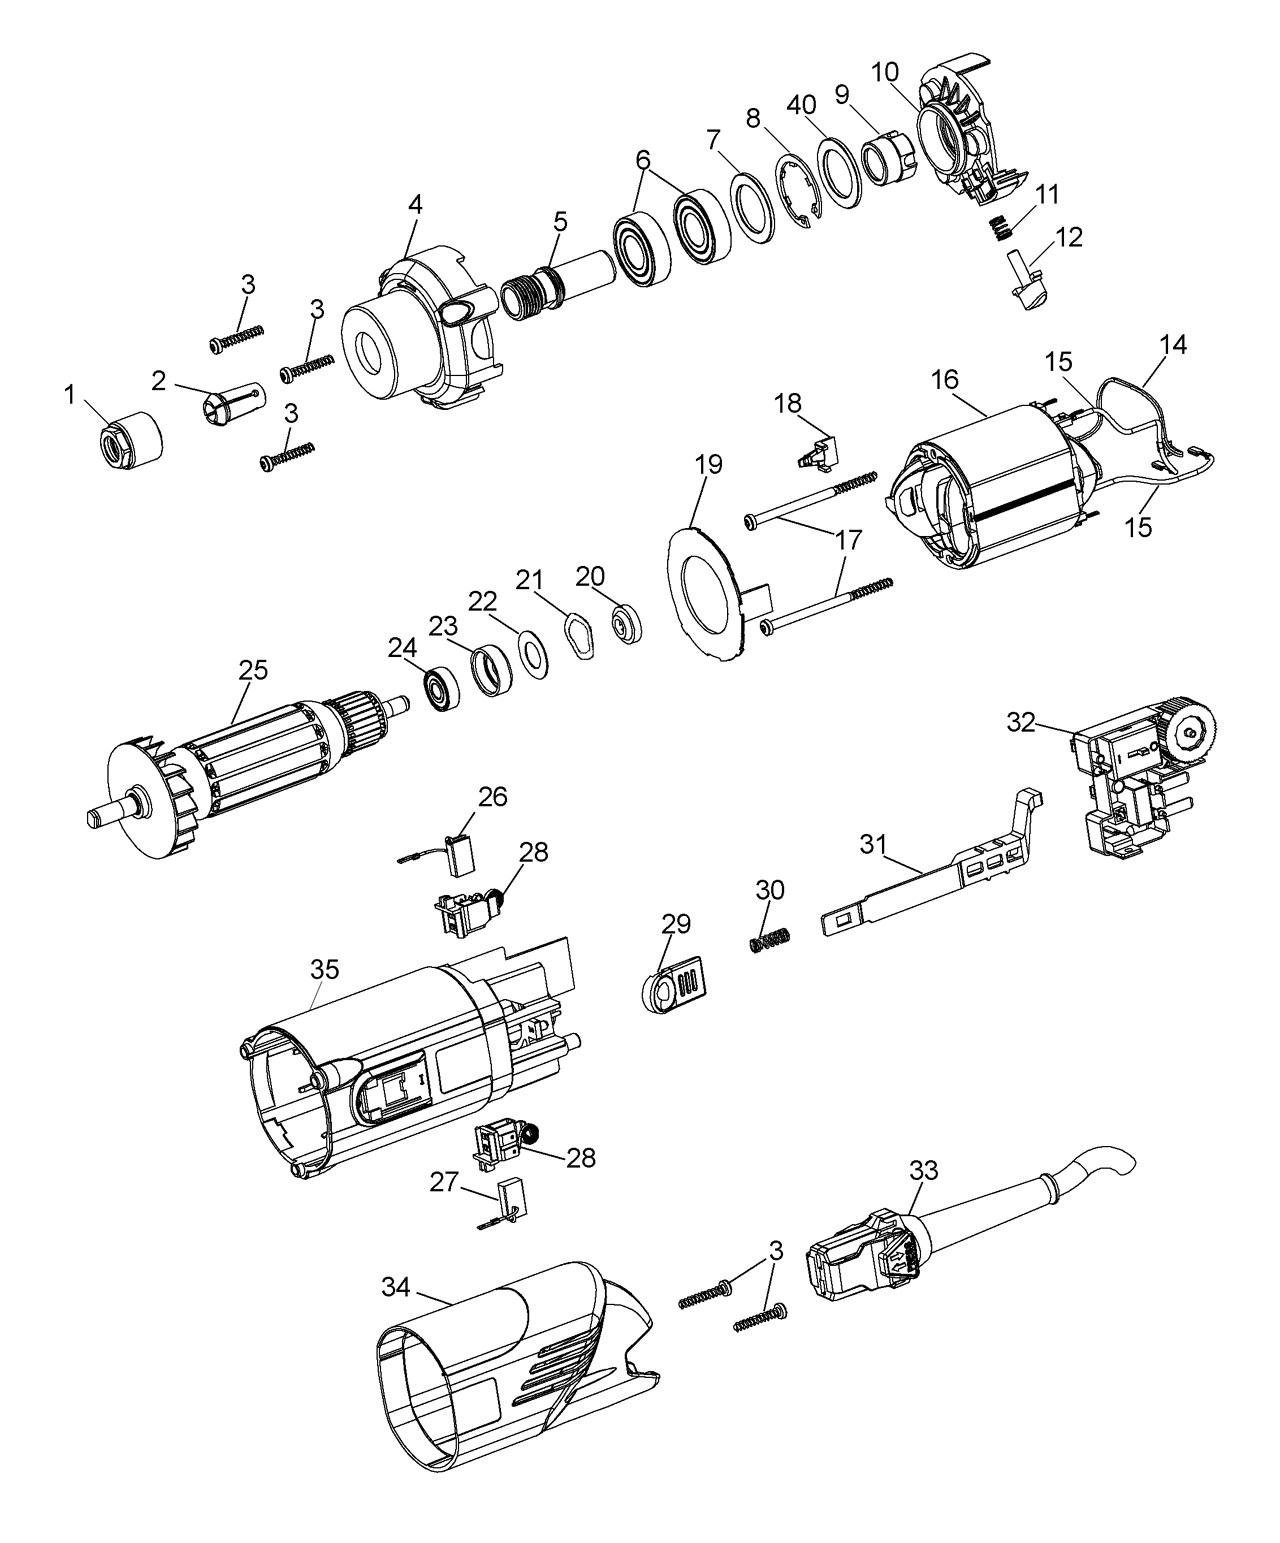 2460 kress 1050 spare parts